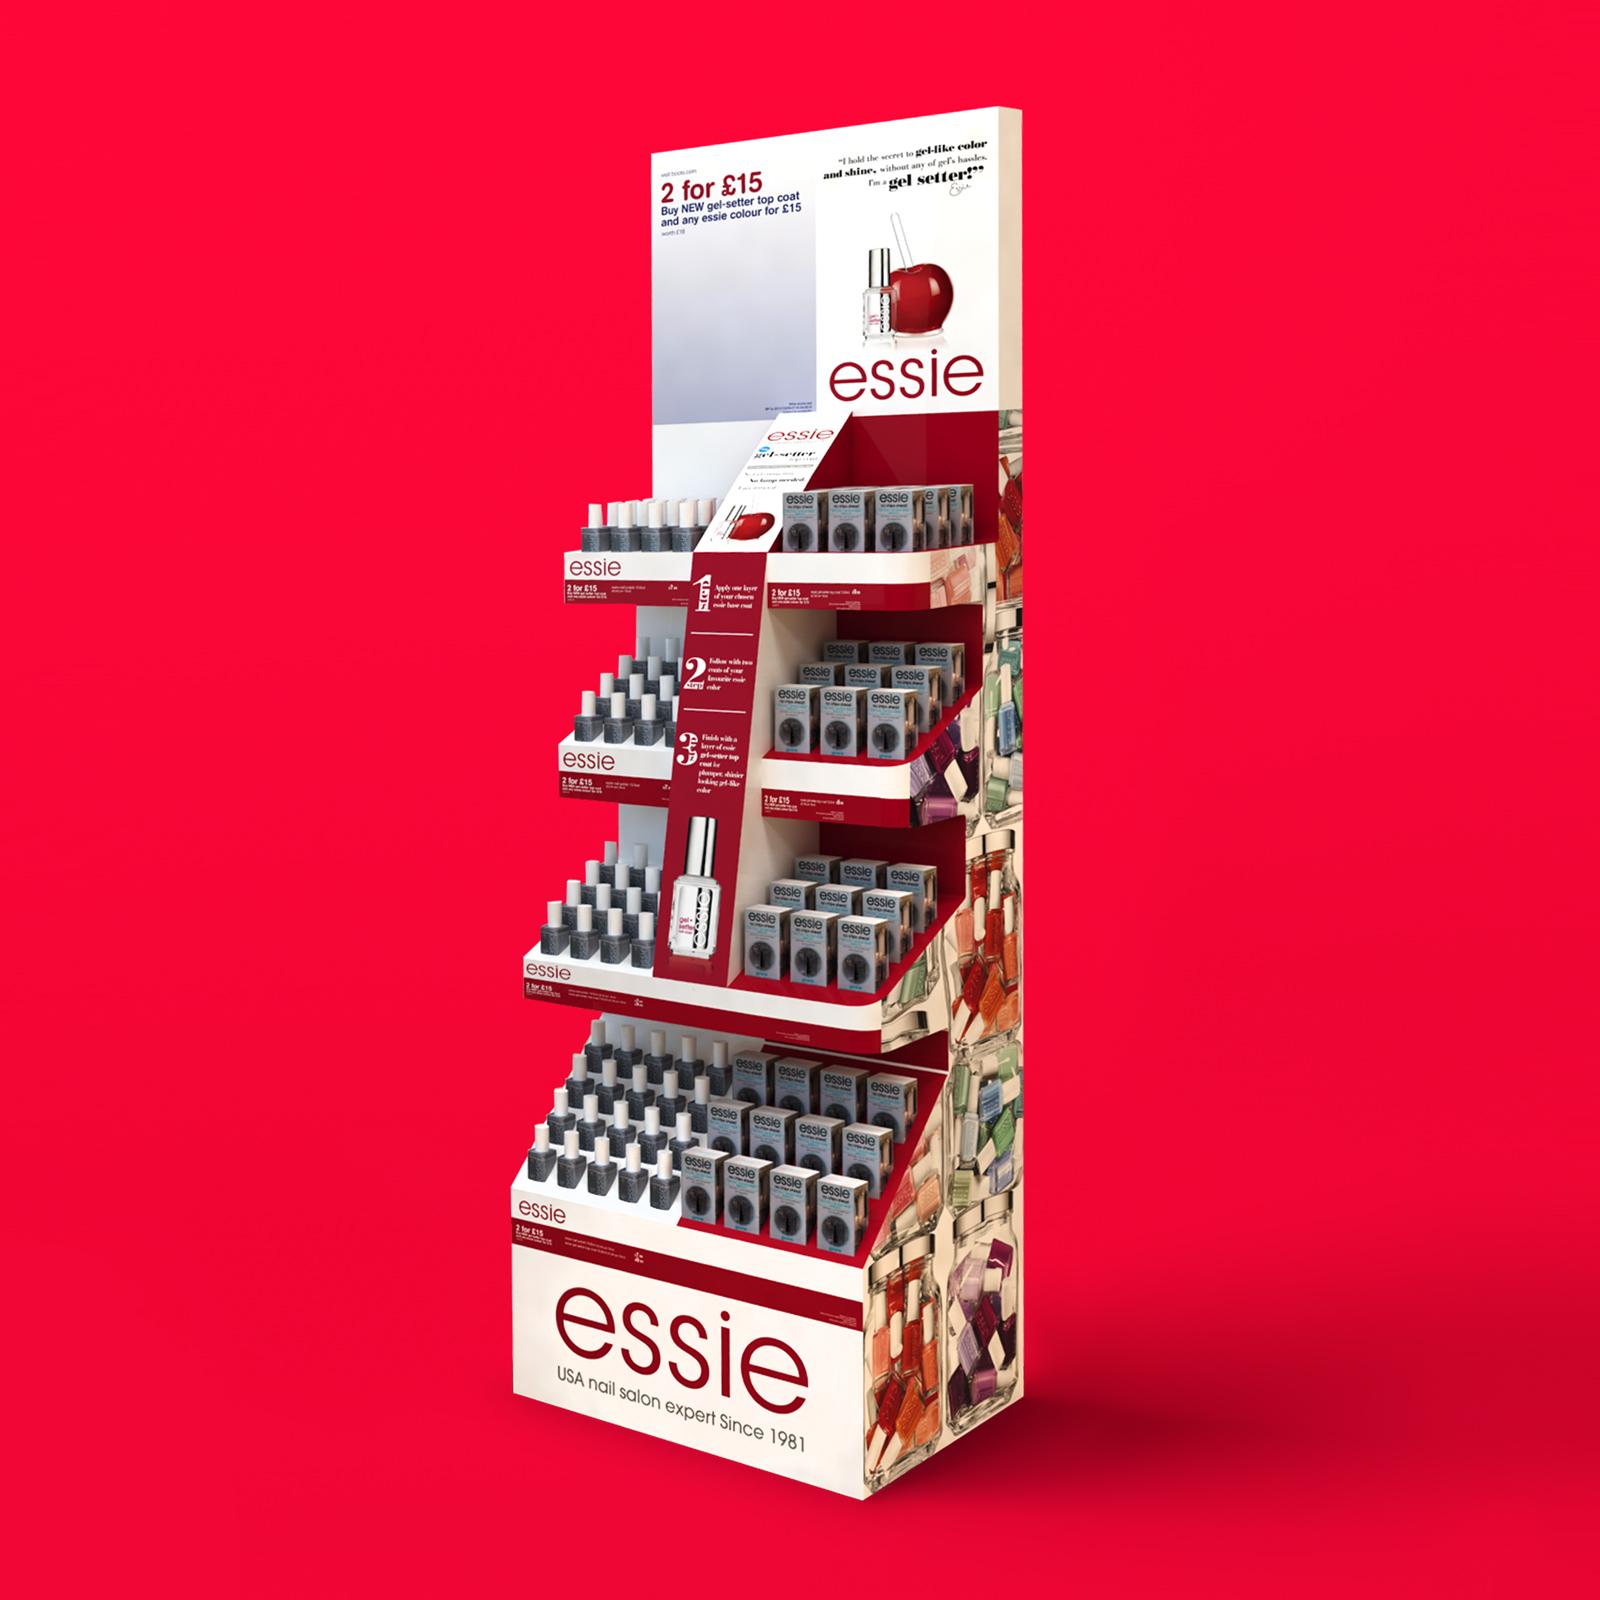 Essie Gel-Setter Free Standing Display Unit